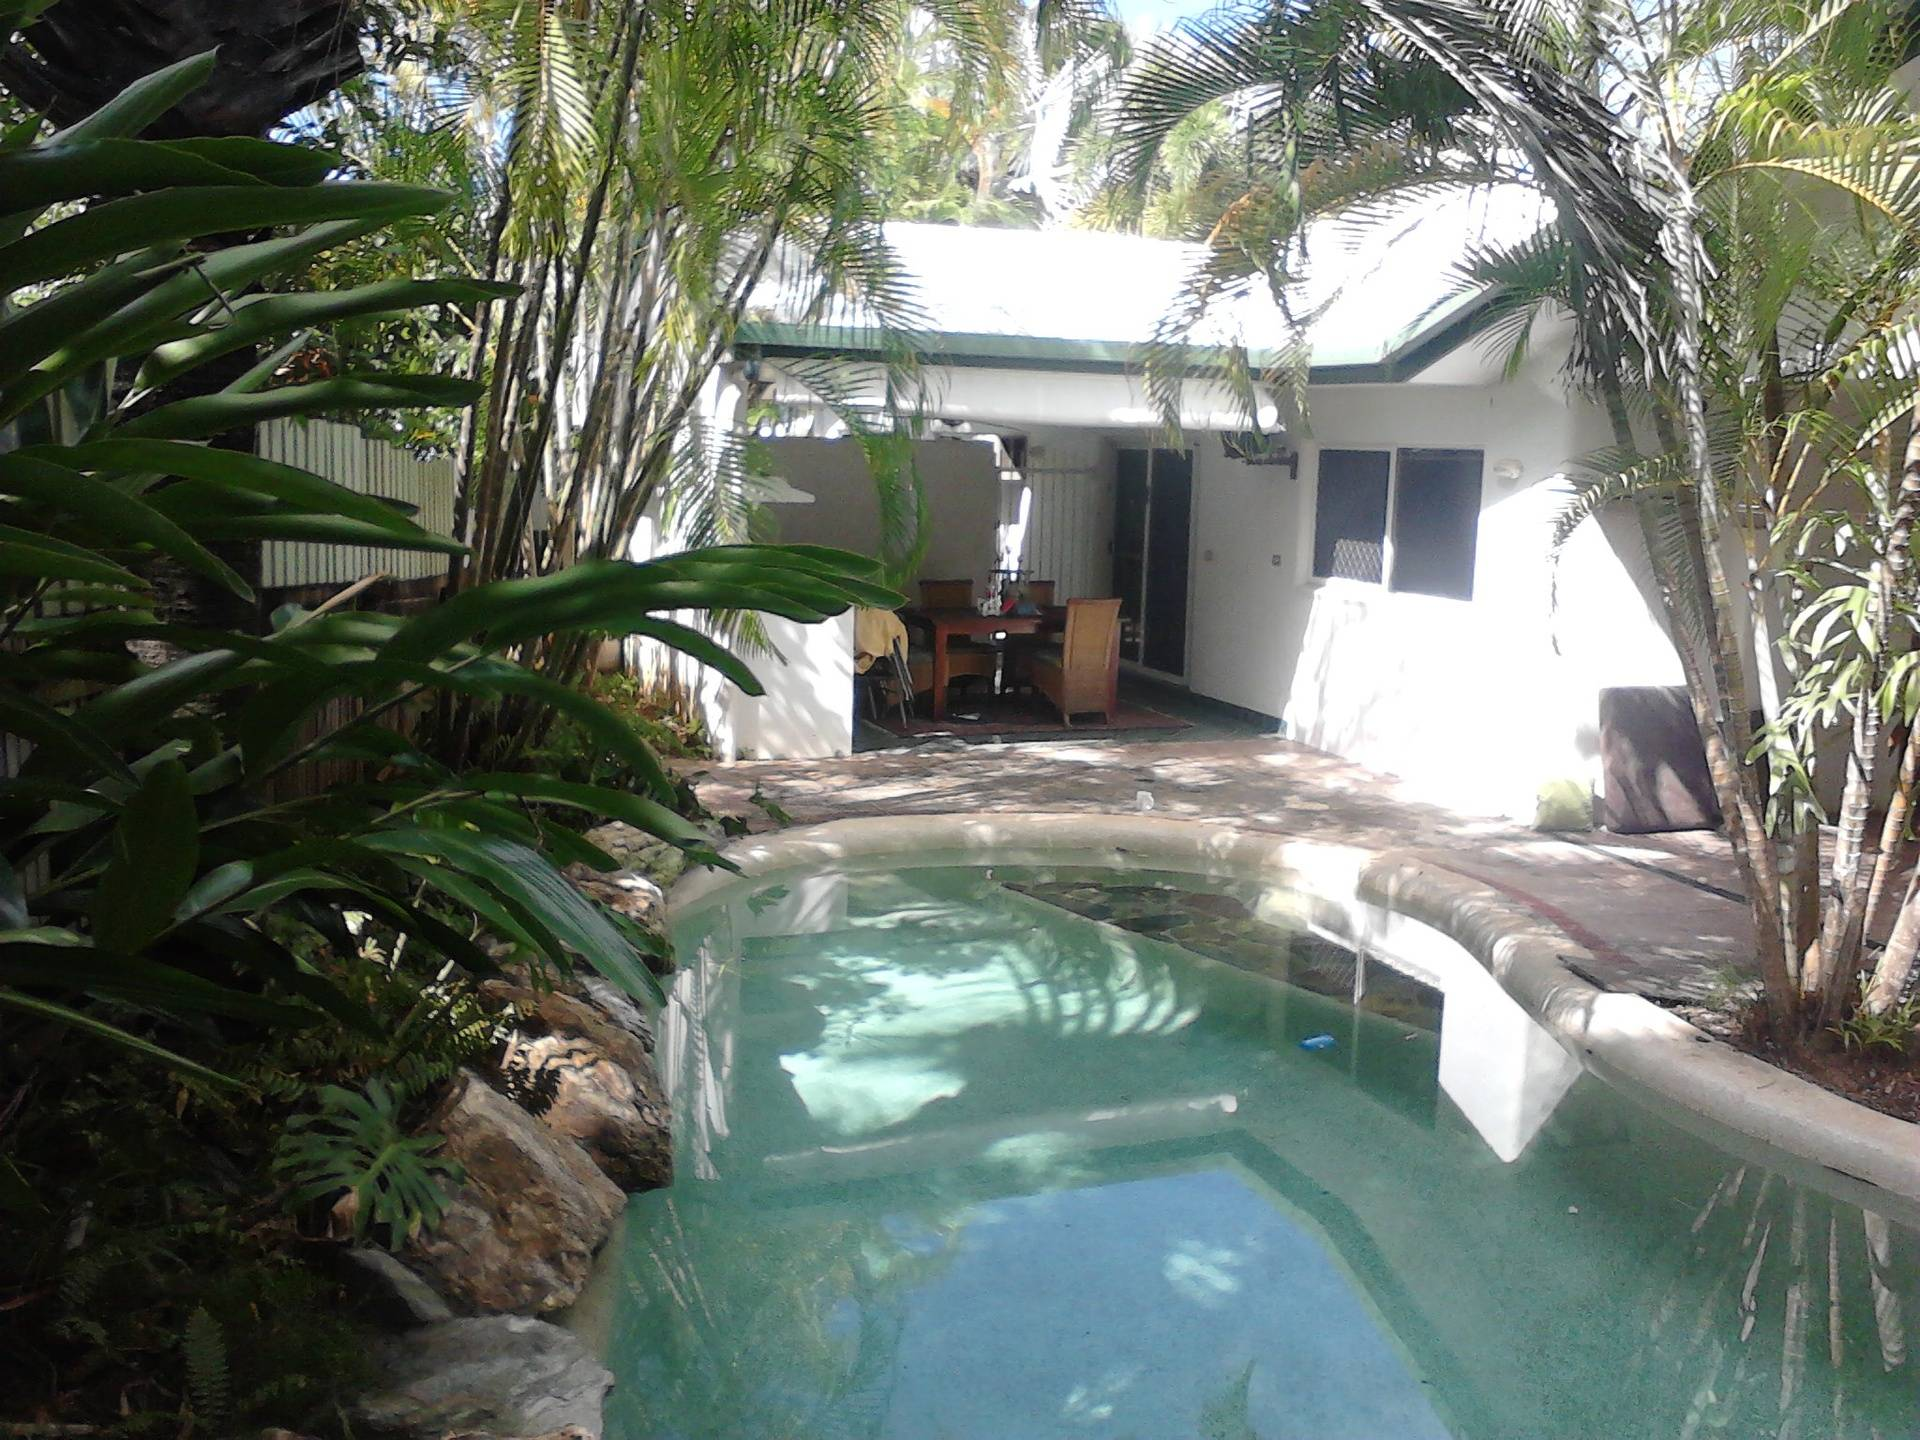 Back Pool Aera After